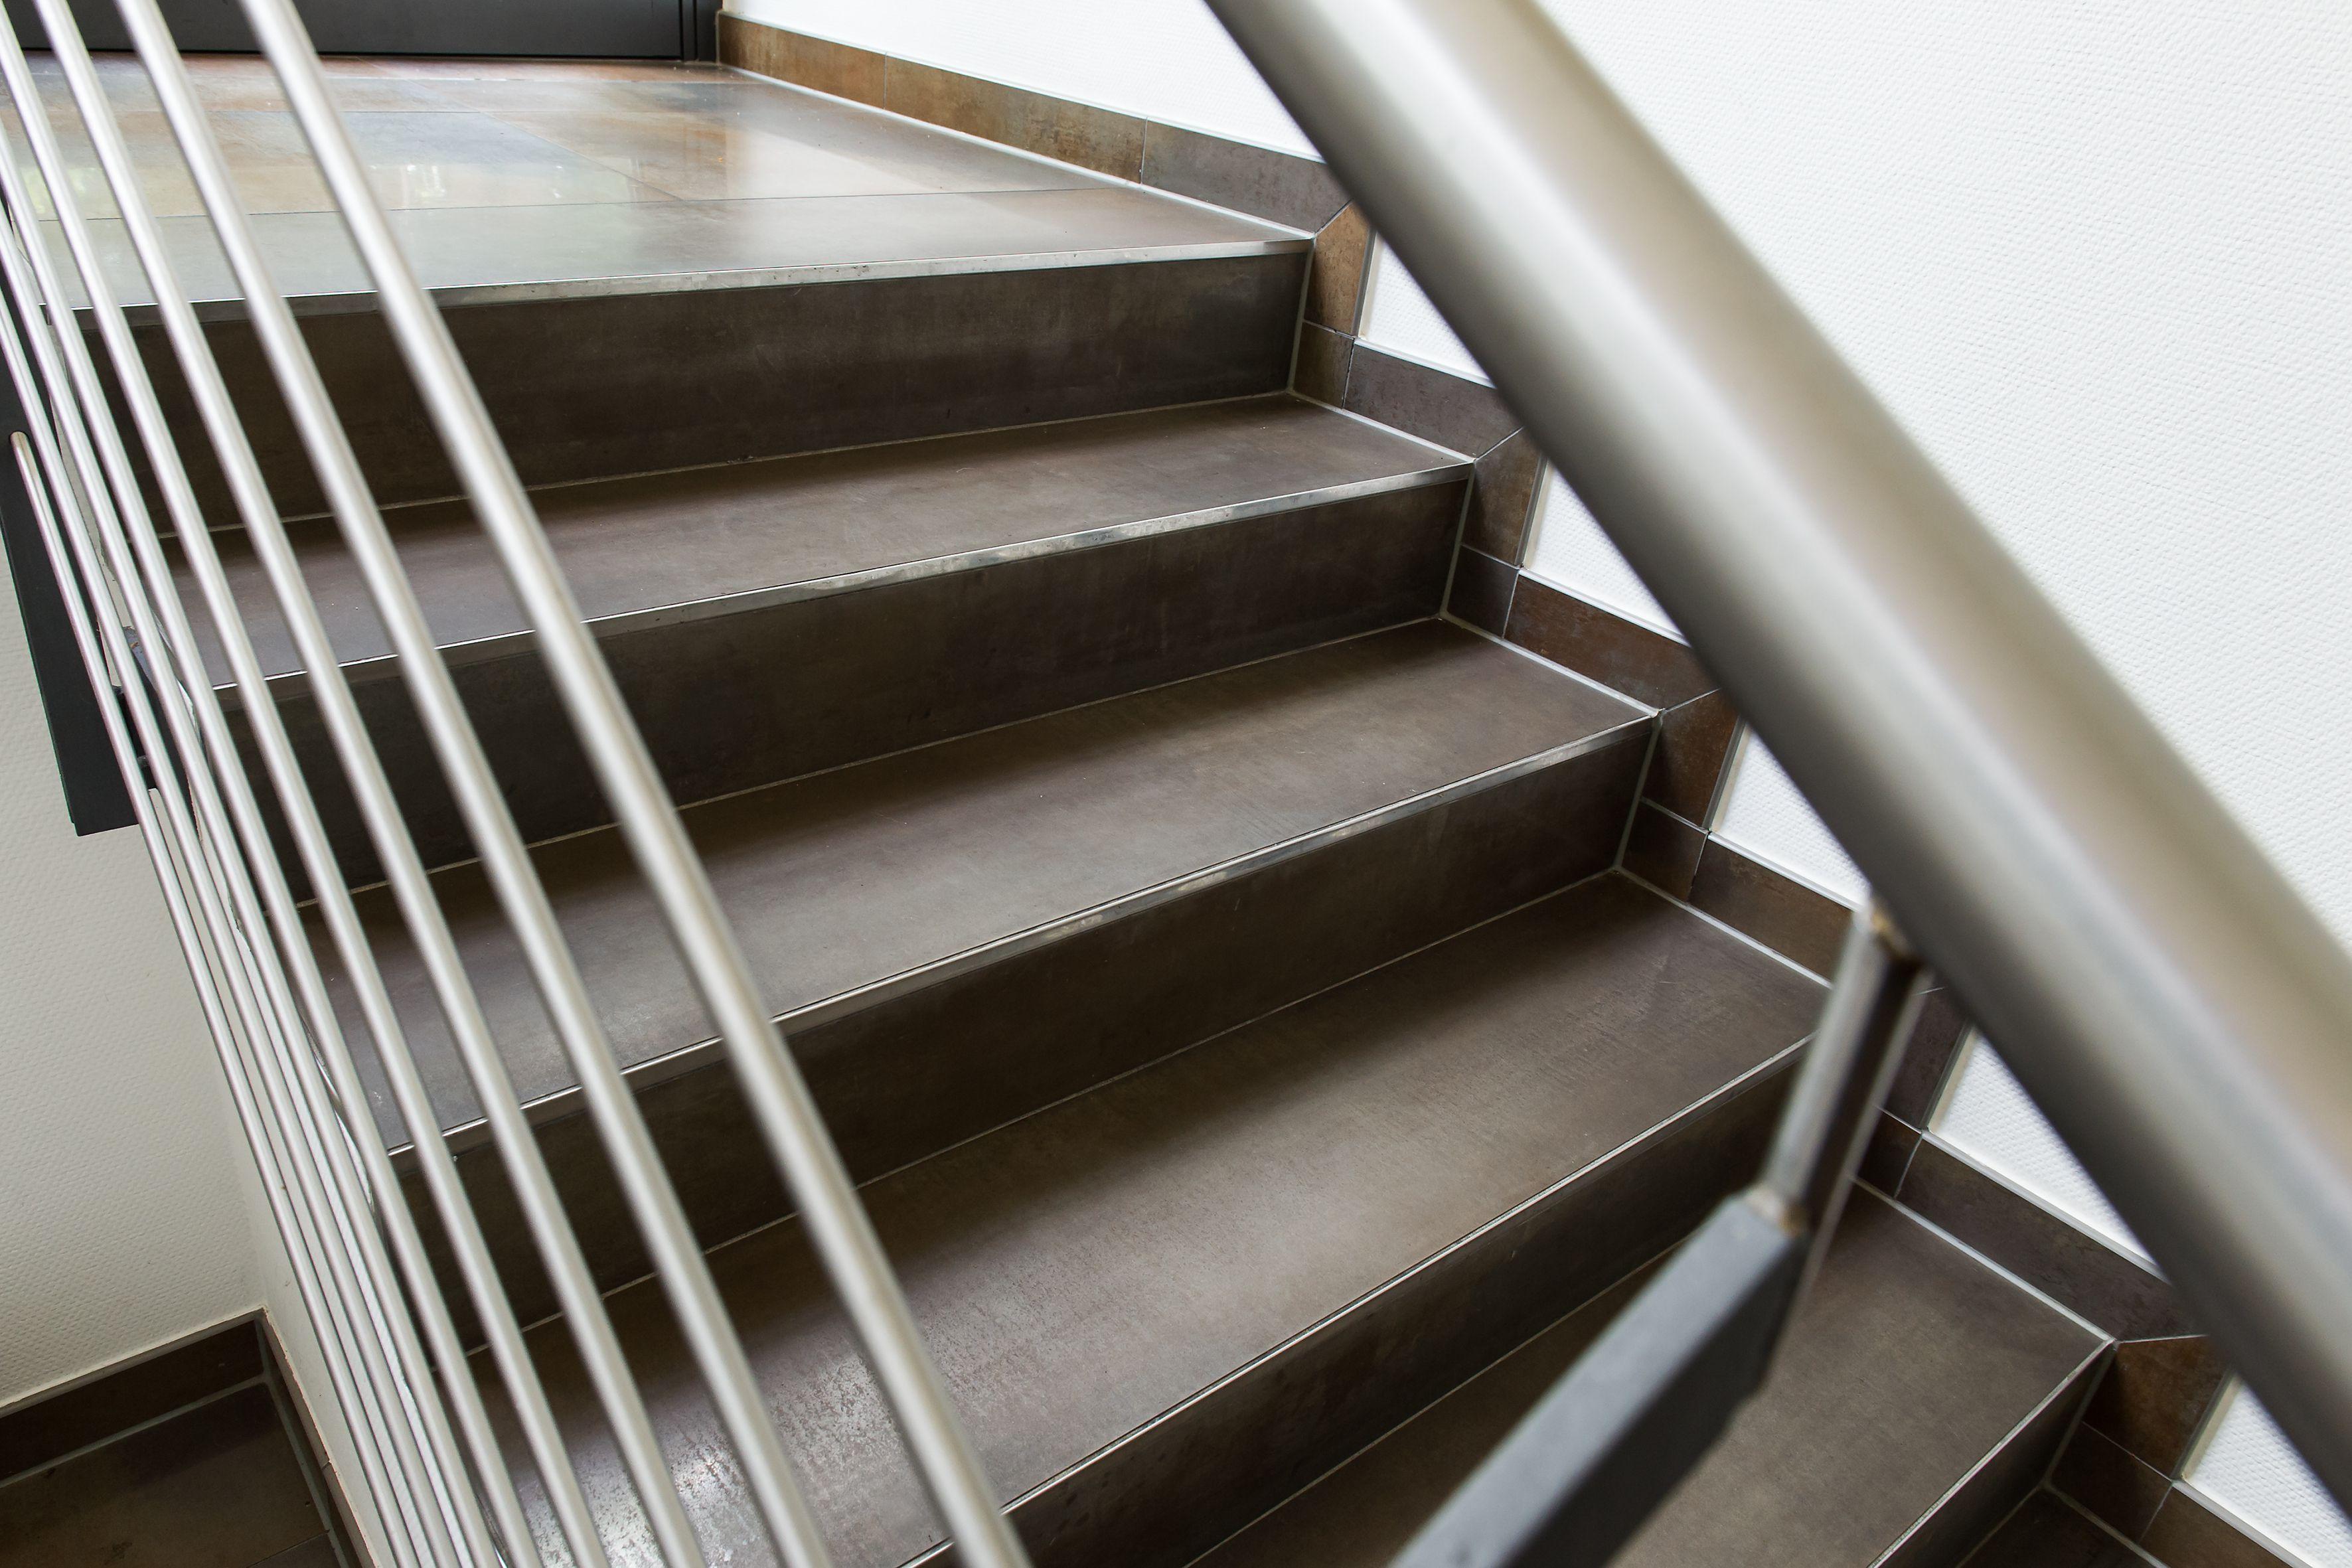 balkone terassen aussentreppen fliesen staack. Black Bedroom Furniture Sets. Home Design Ideas